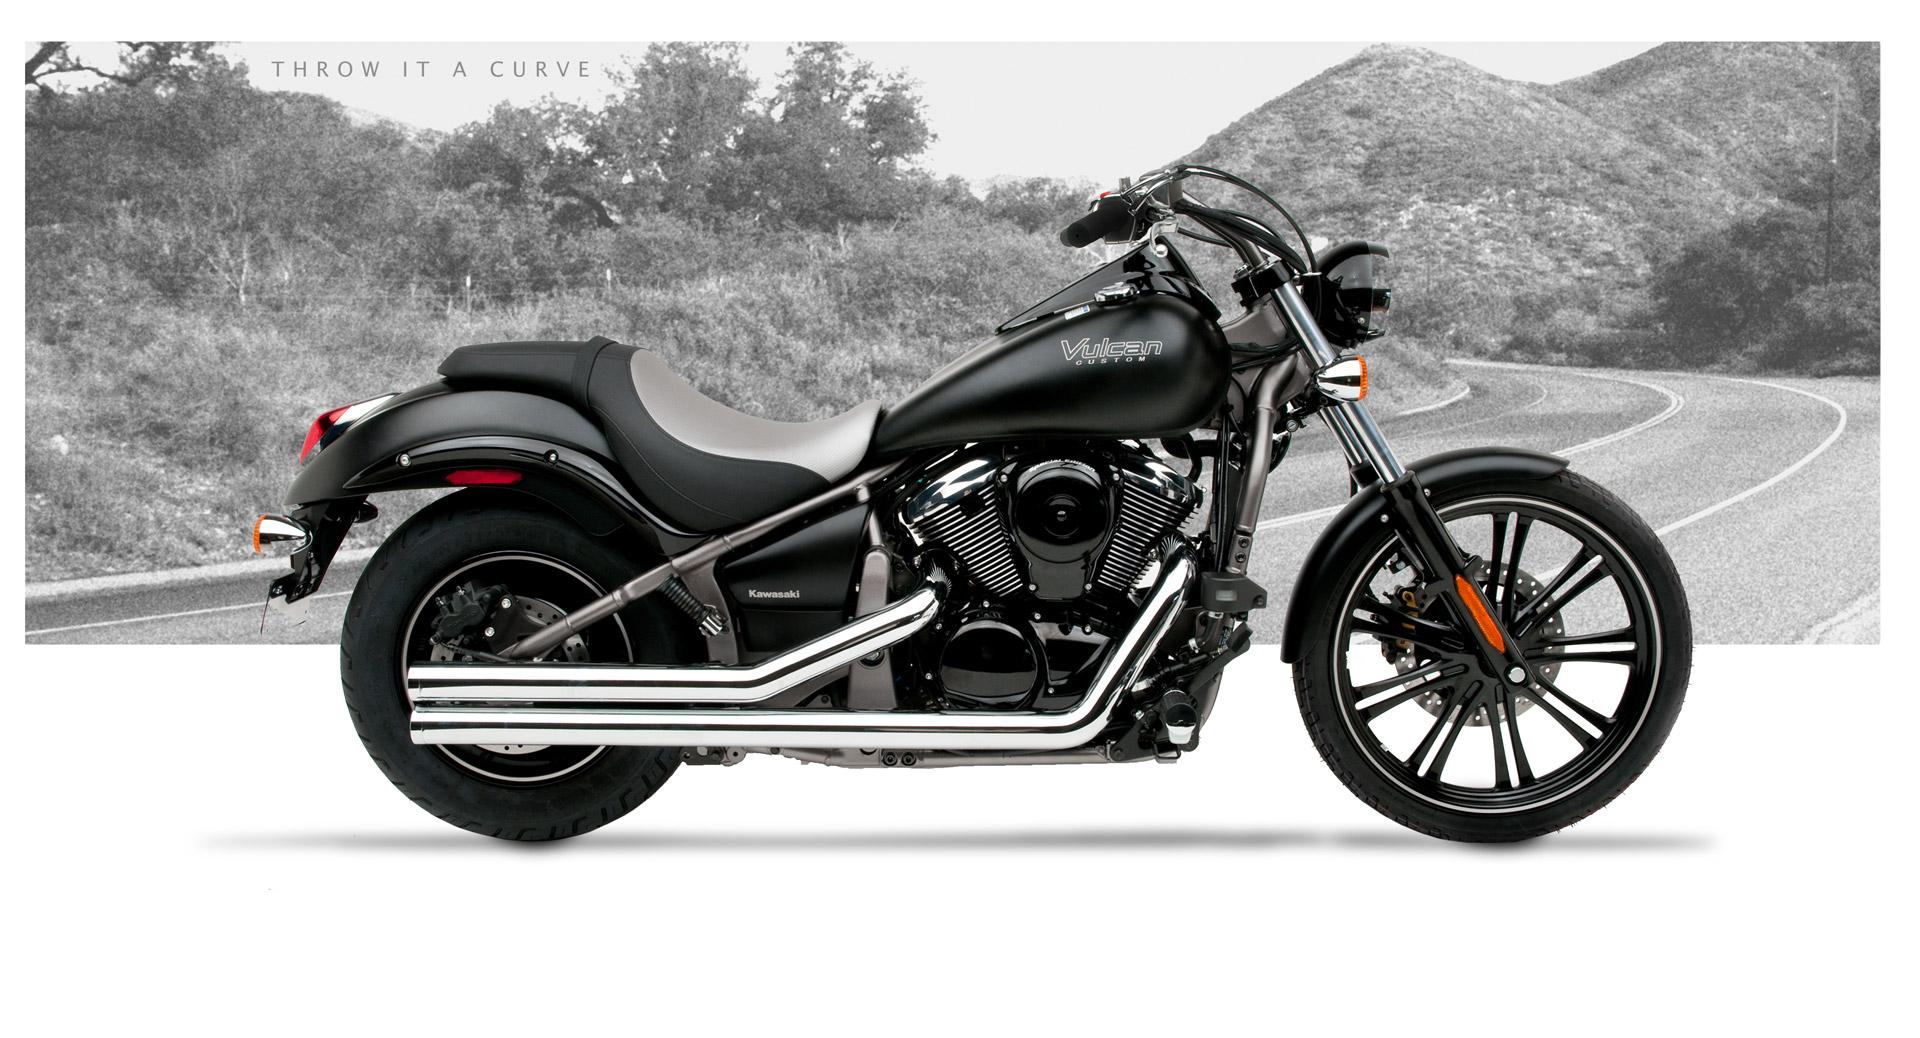 Kawasaki Vulcan 900 Custom Motorcycle Exhaust - American